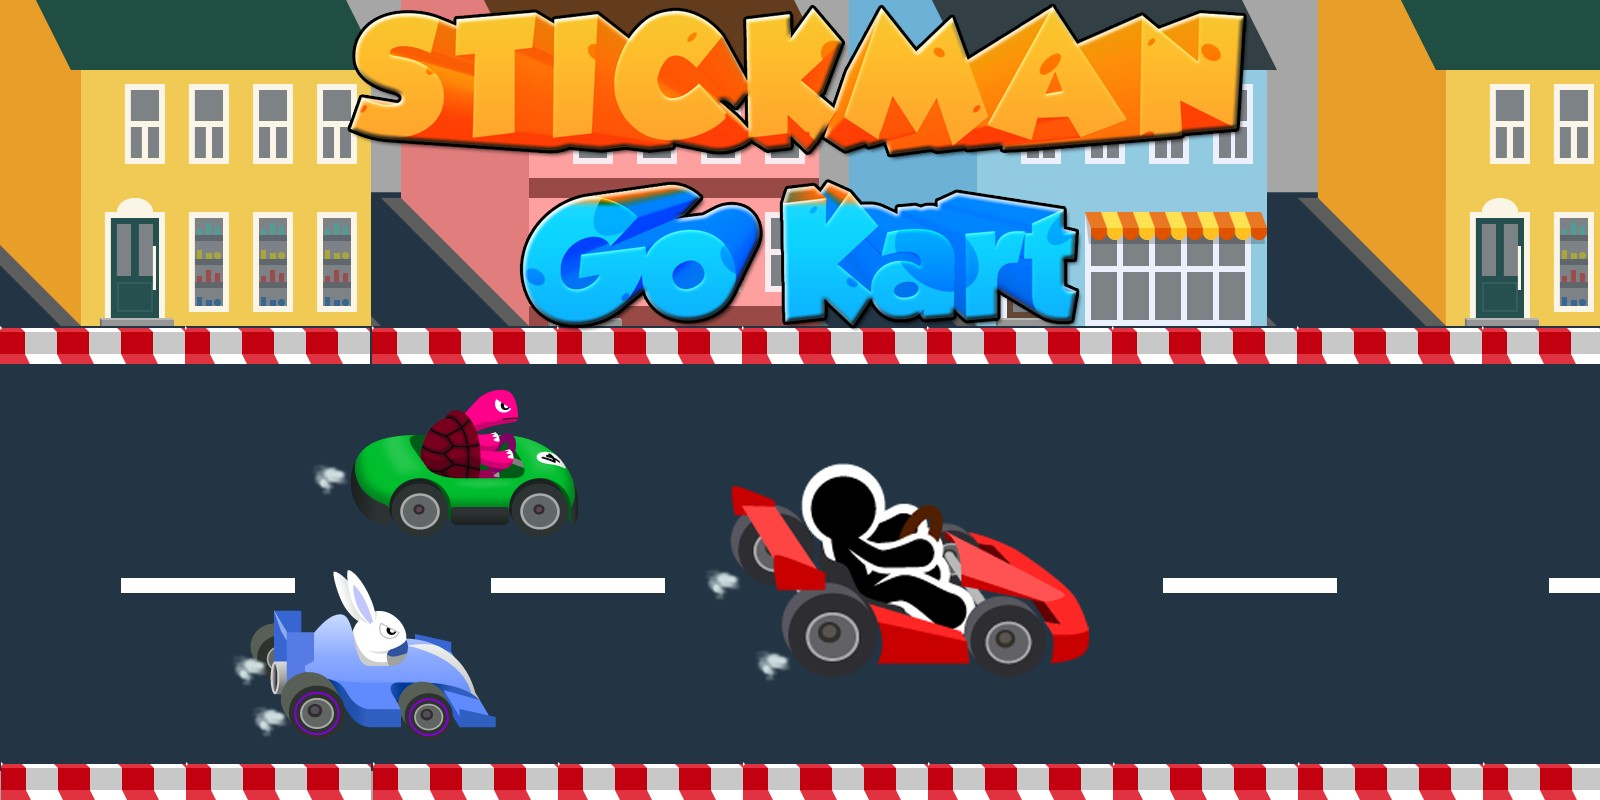 Stickman Go Kart - Buildbox Template